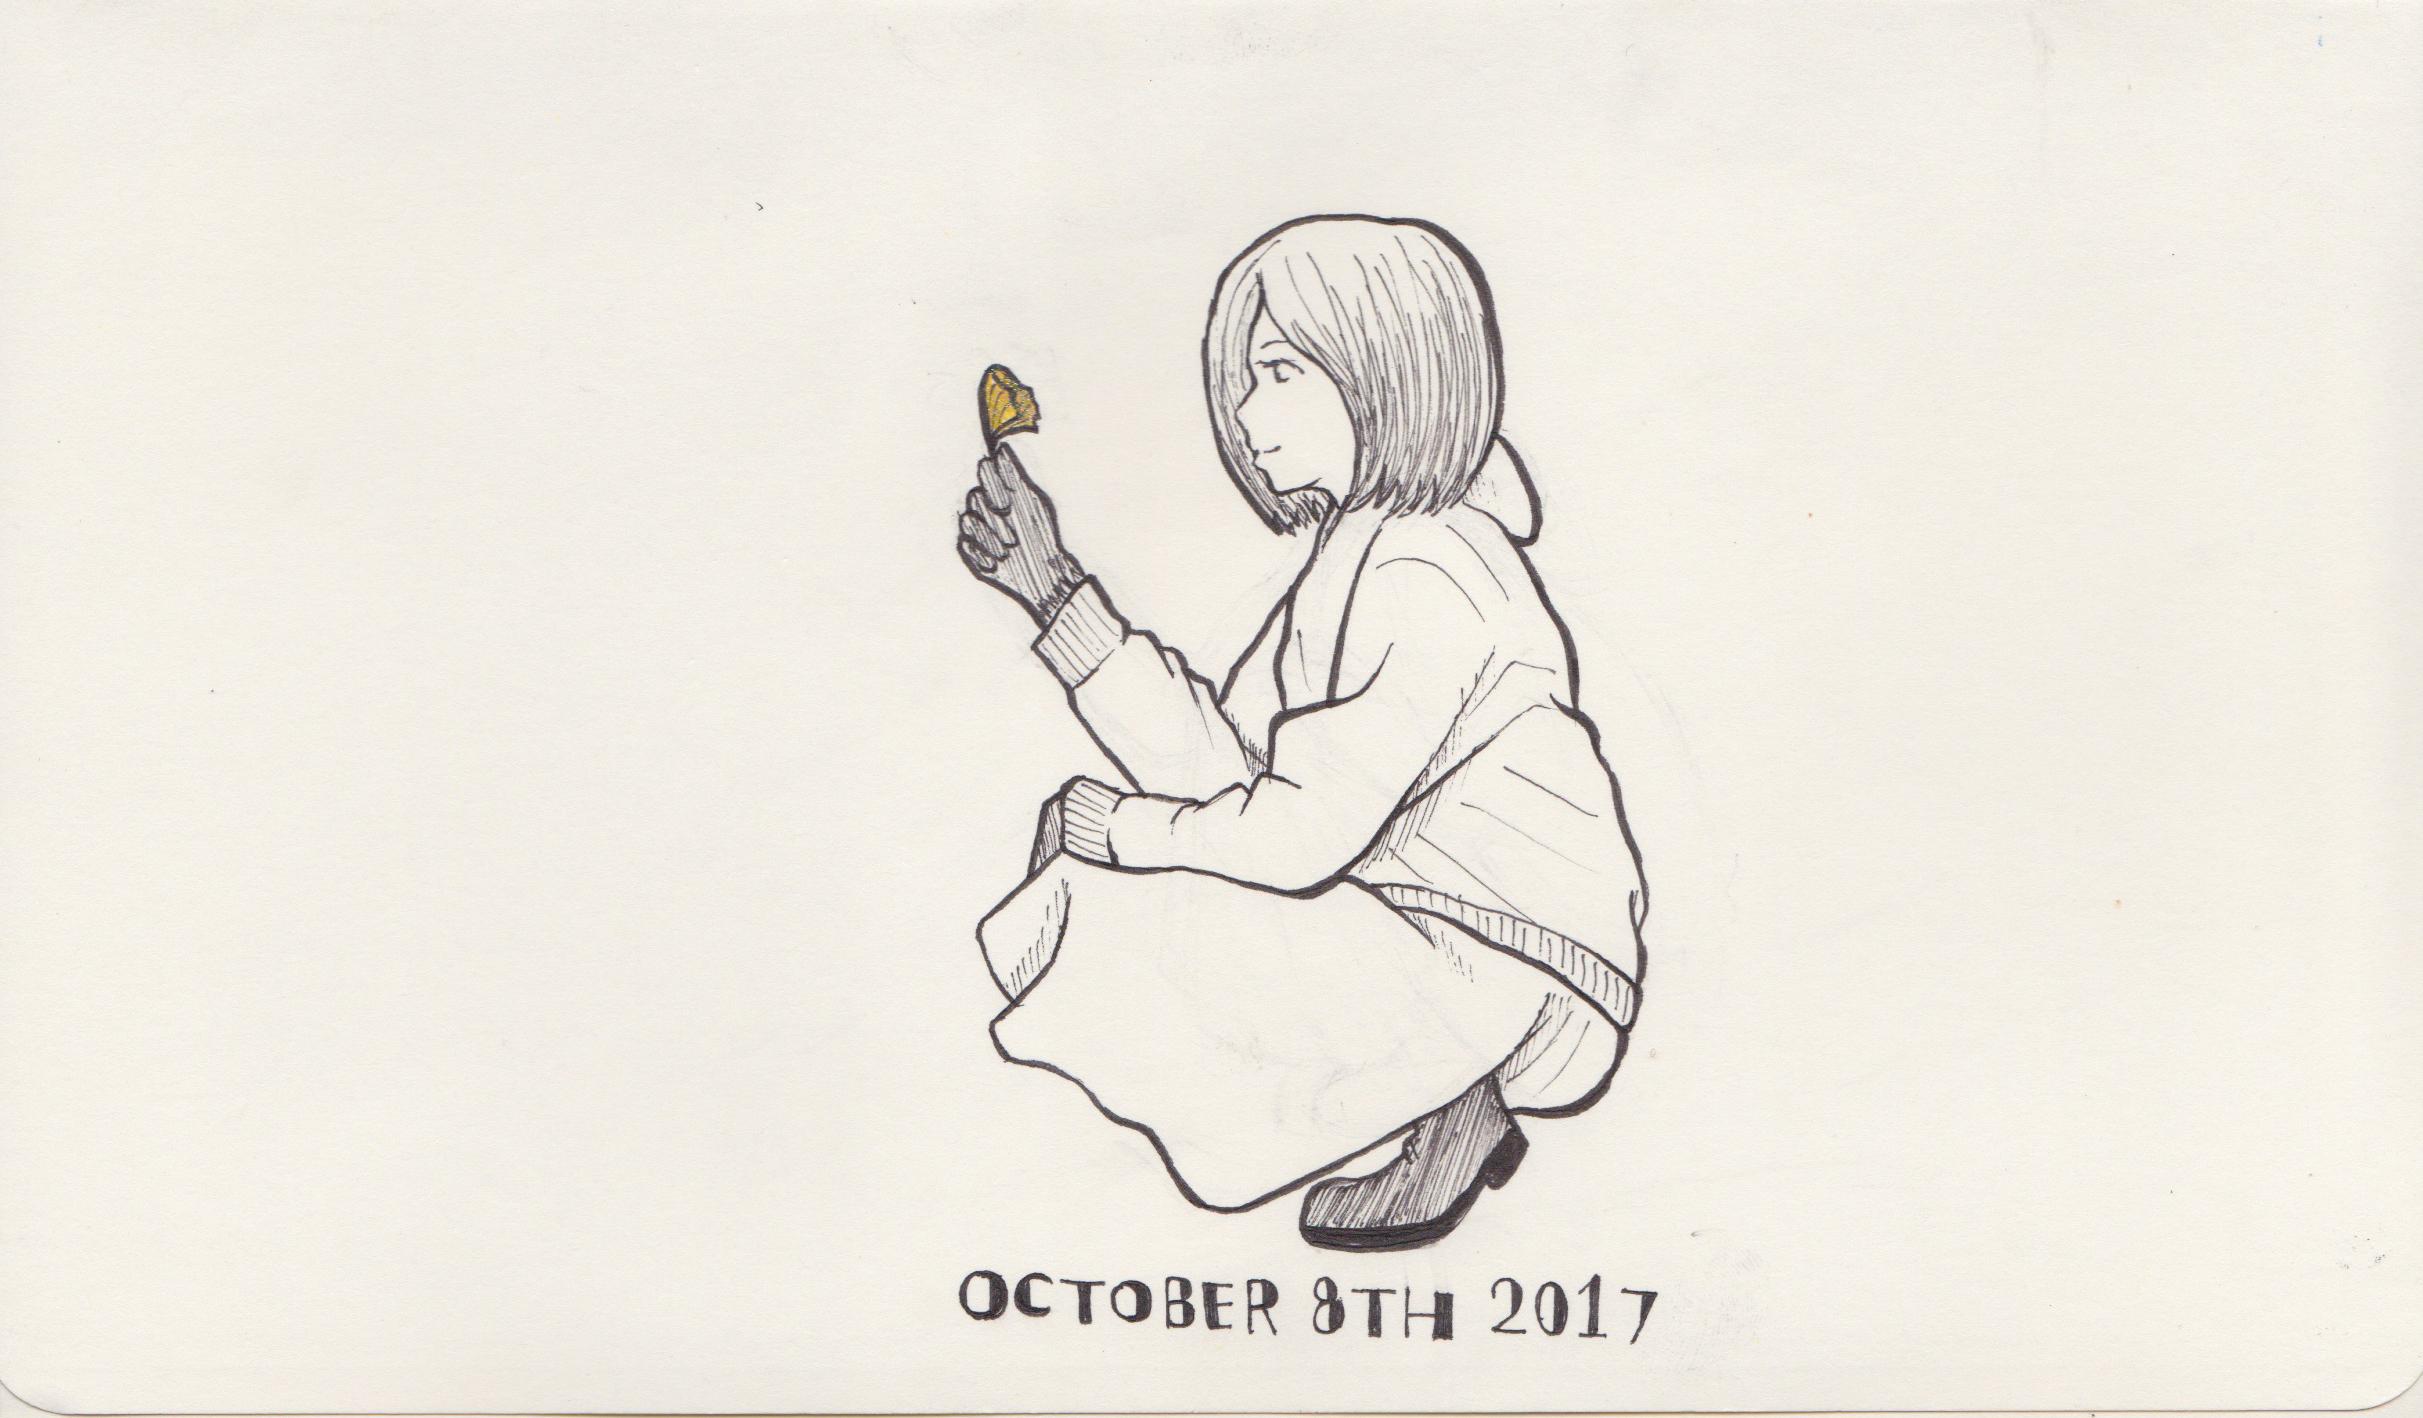 2017/10/08